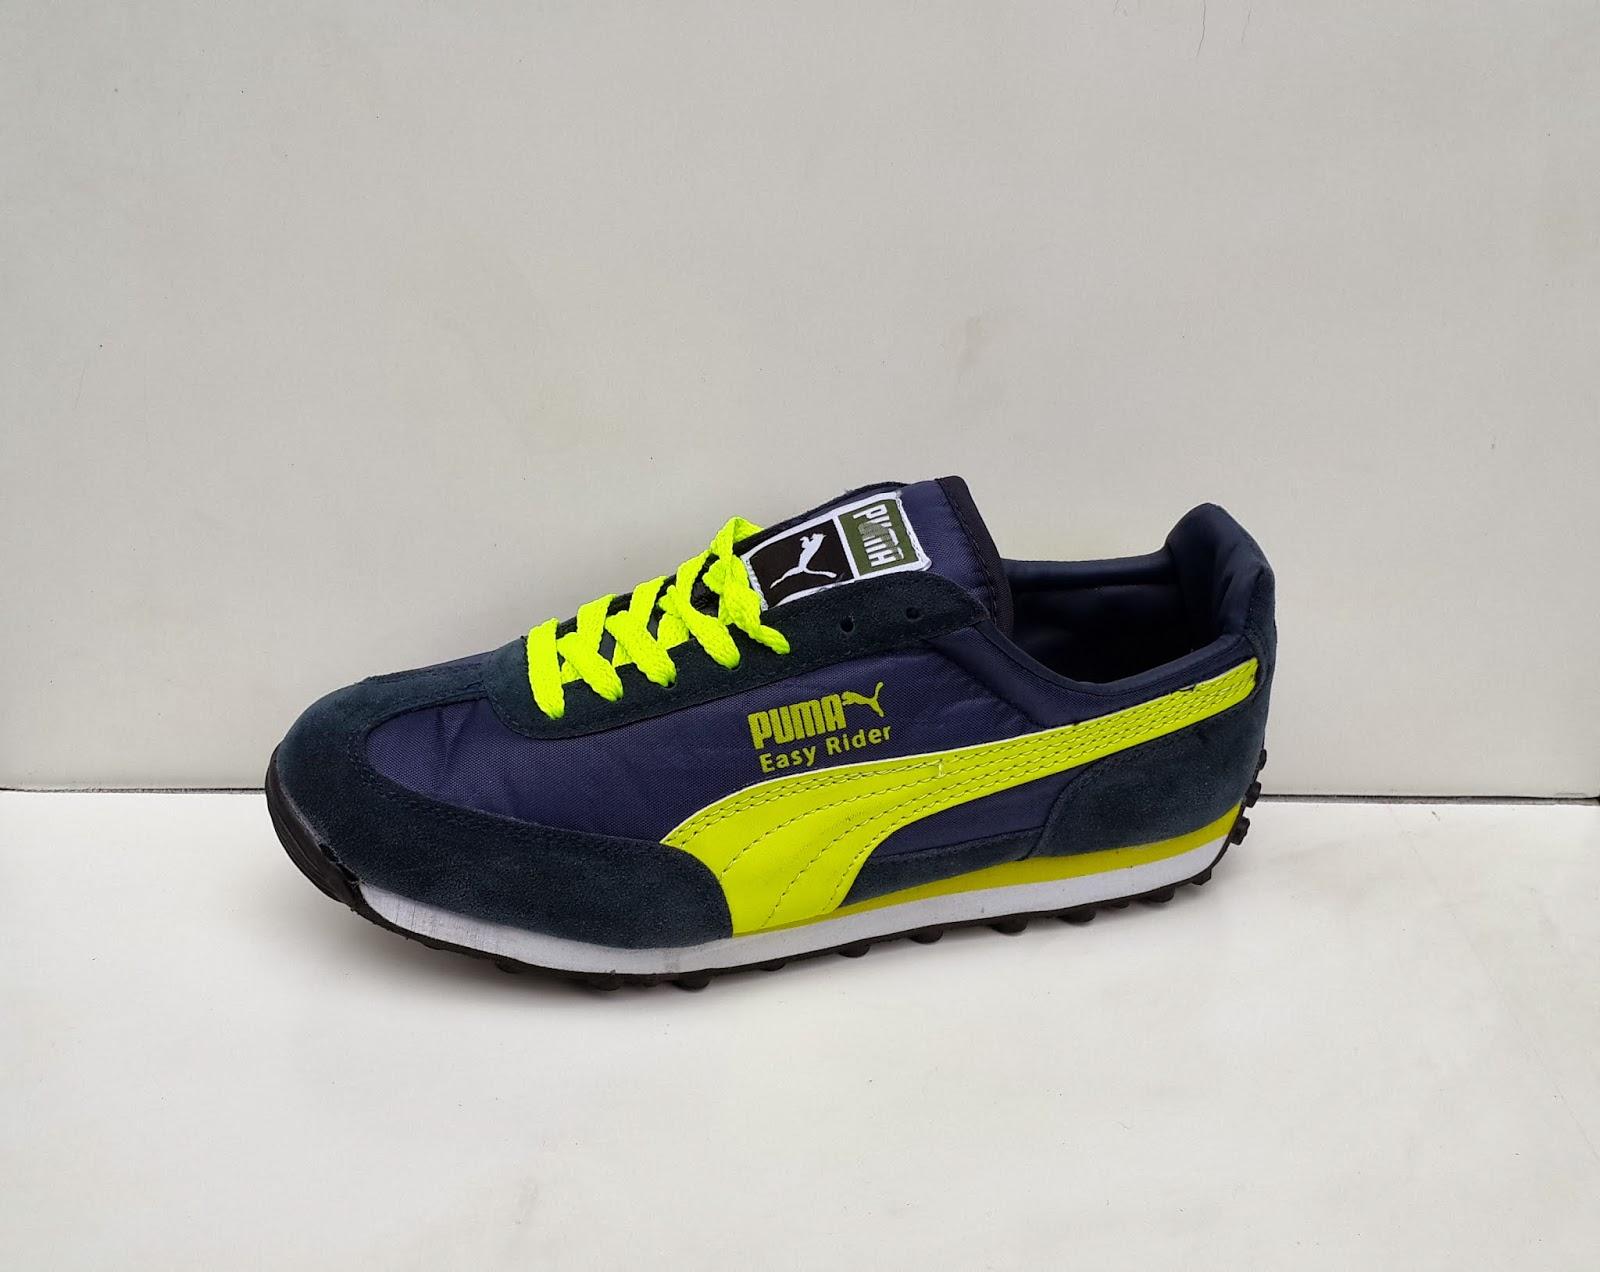 Sepatu Puma Easy Rider harga grosir, gambar sepatu puma warna biru, toko sepatu puma di jakarta